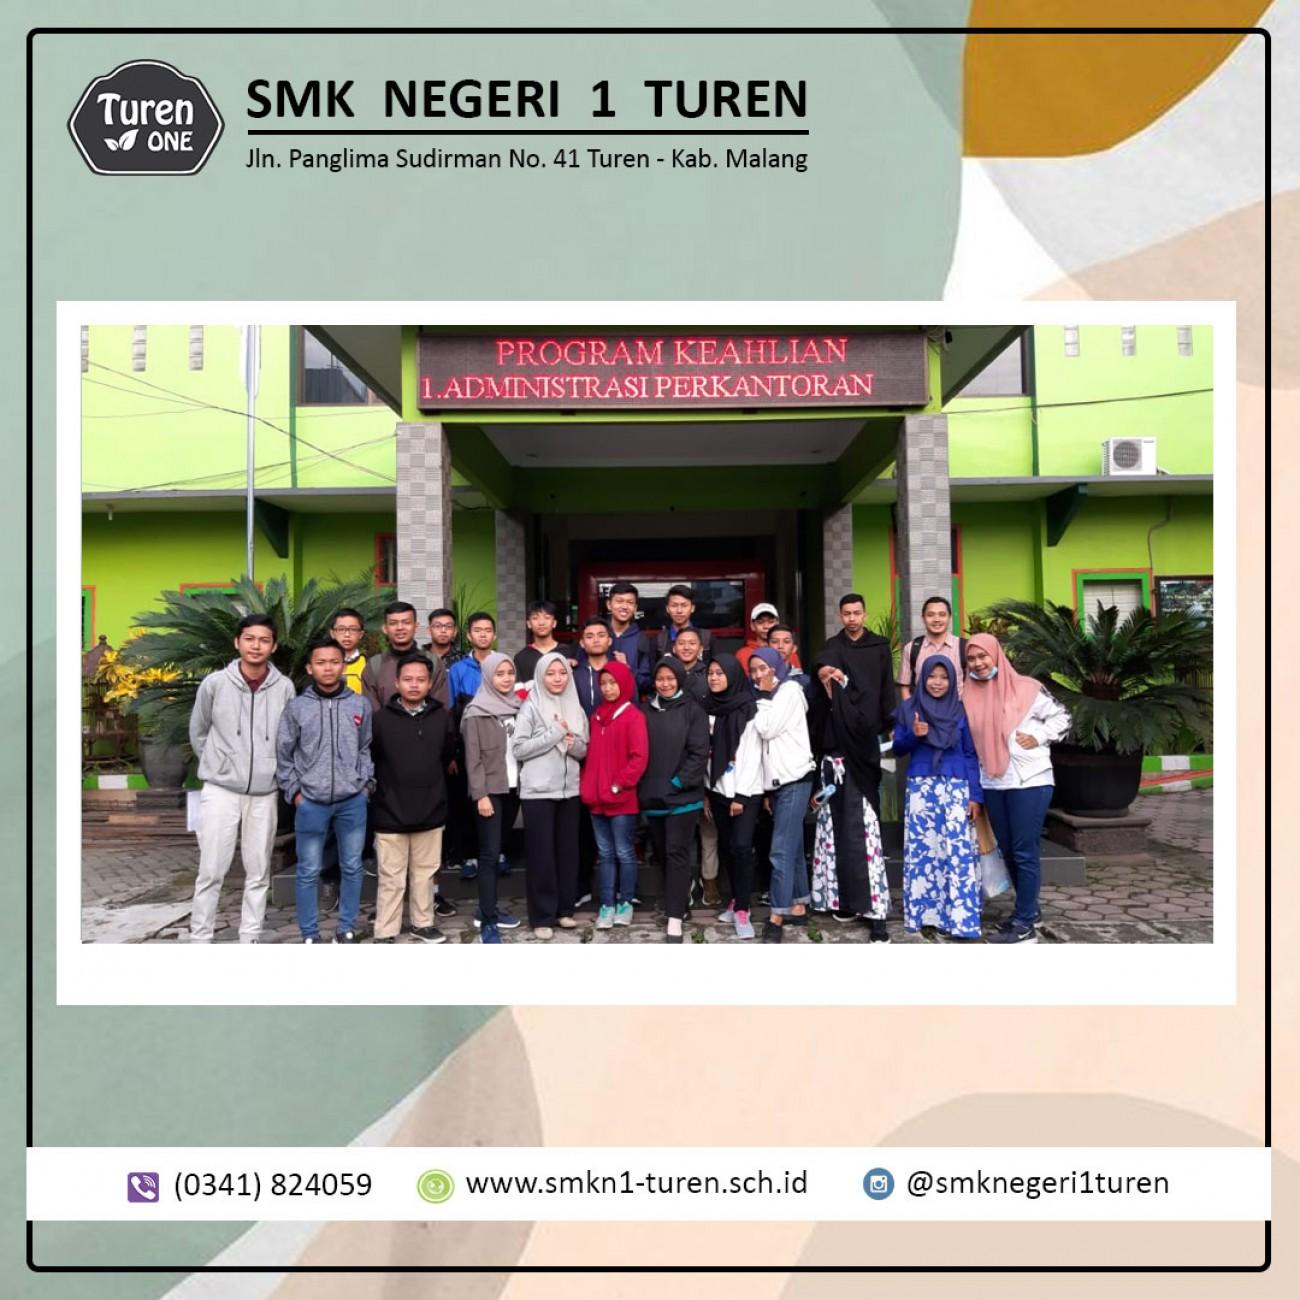 BKK SMKN 1 Turen Mengantarkan 24 Peserta Pelatihan di API Madiun